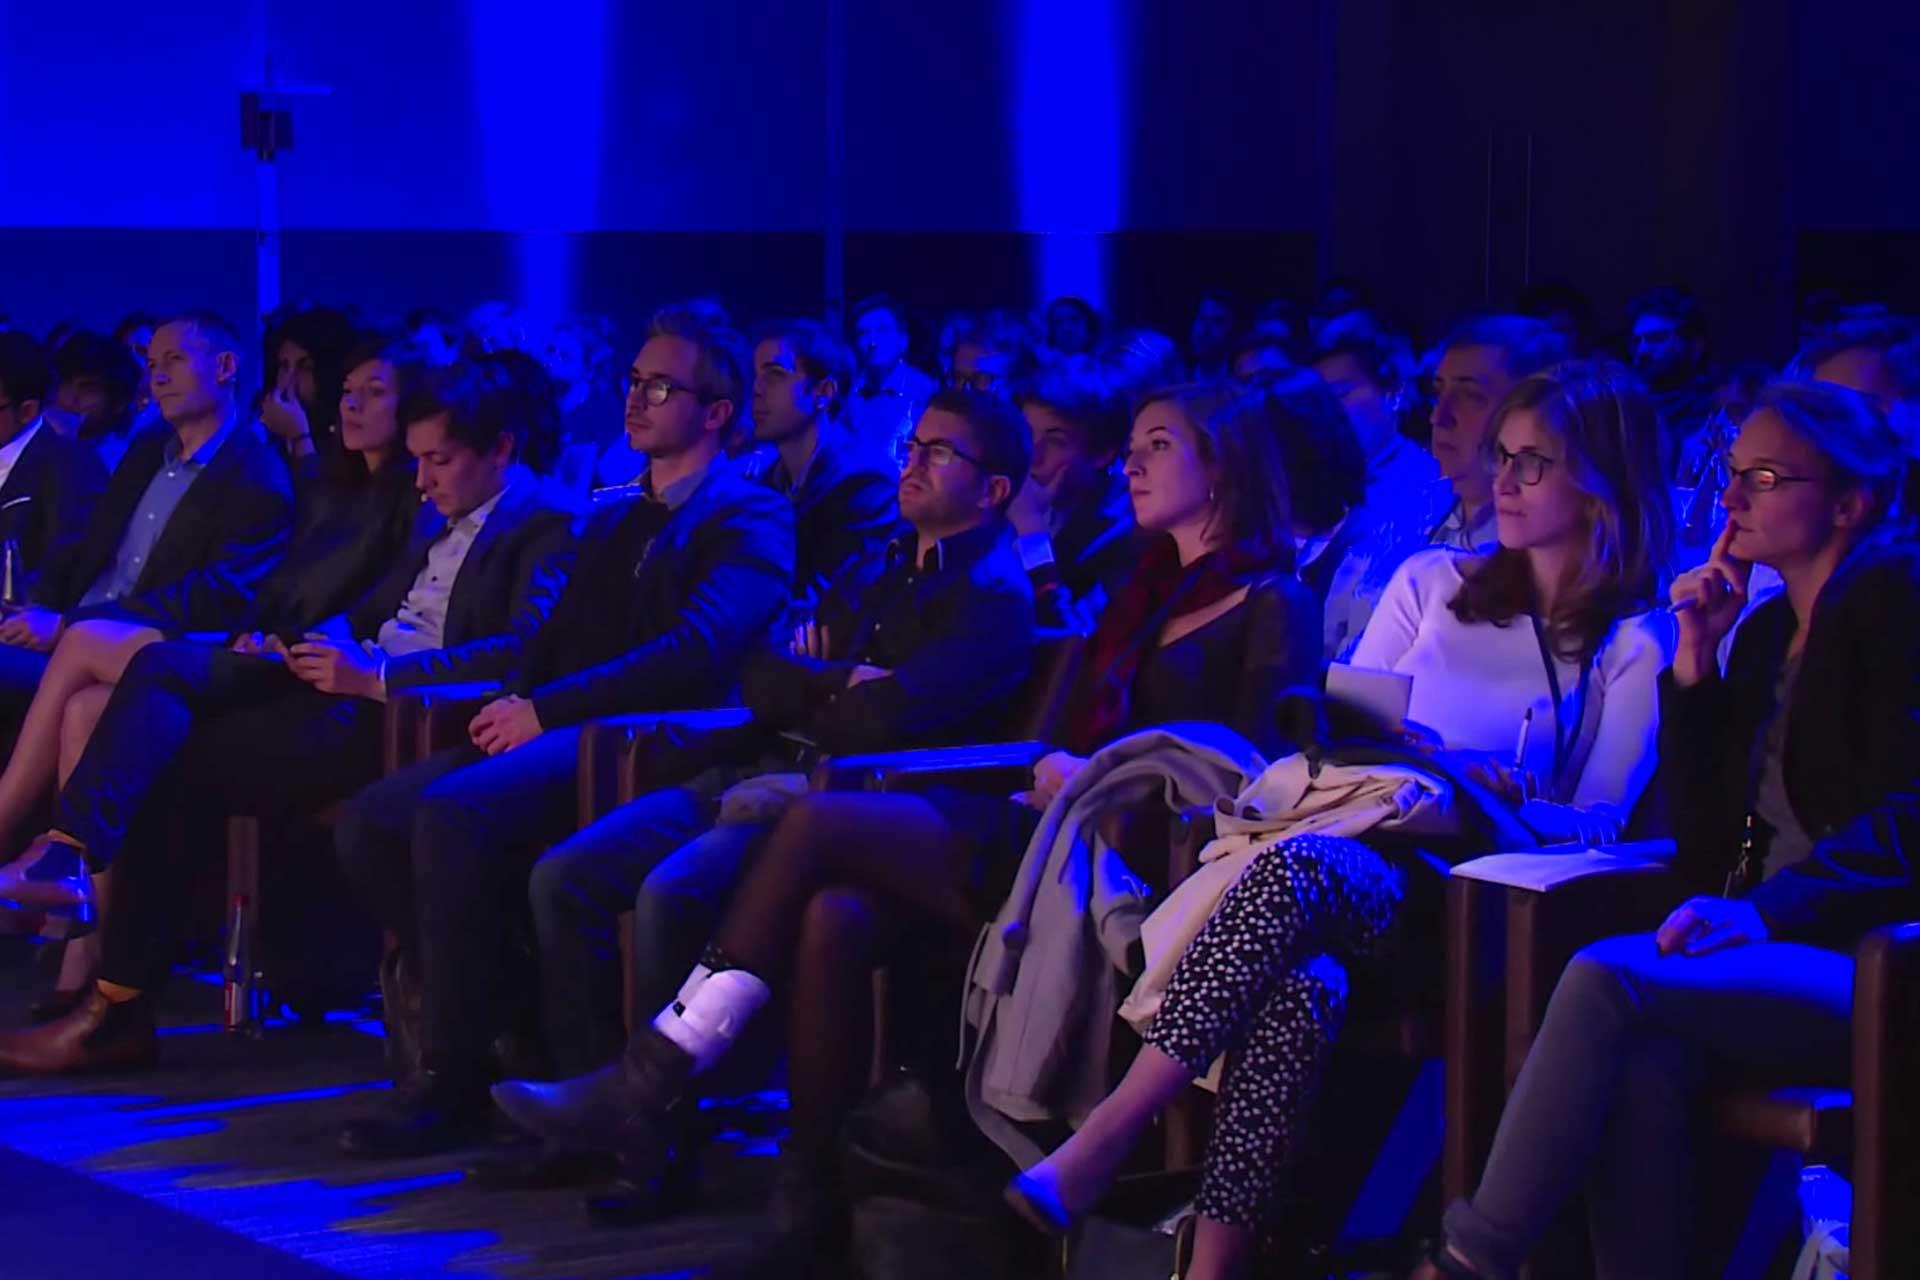 conference-TEDxParisSalon-2015-3.jpg